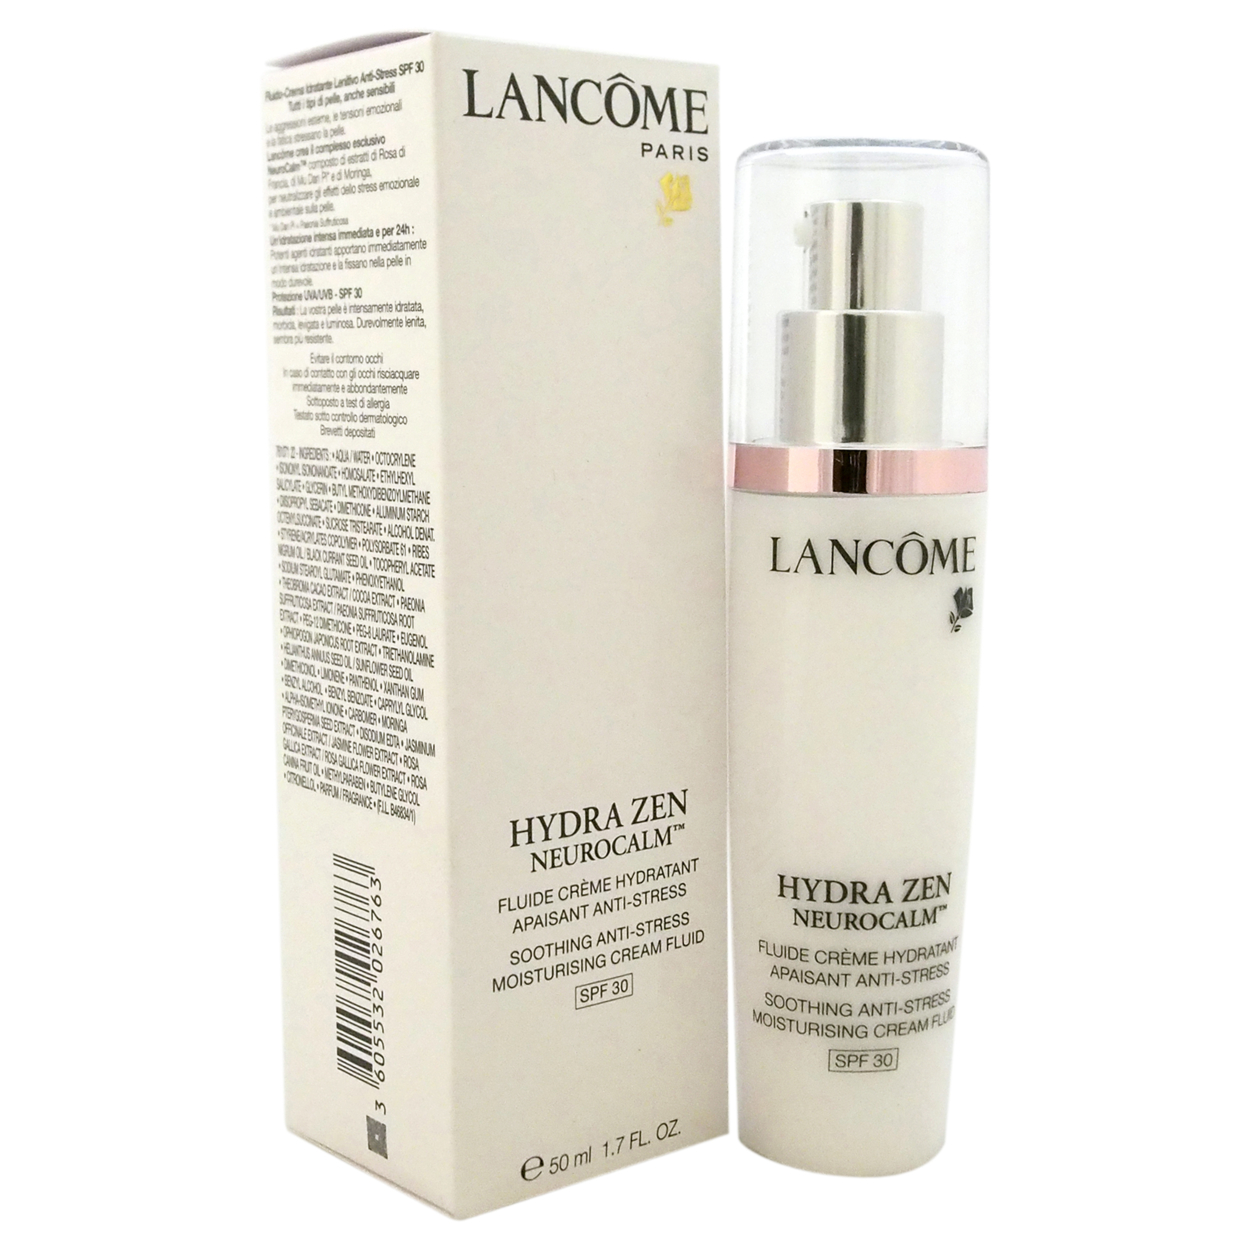 Hydra Zen Neurocalm Soothing Anti Stress Moisturising Cream Fluid Lancme Gel 50ml Spf 30 By Lancome For Unisex